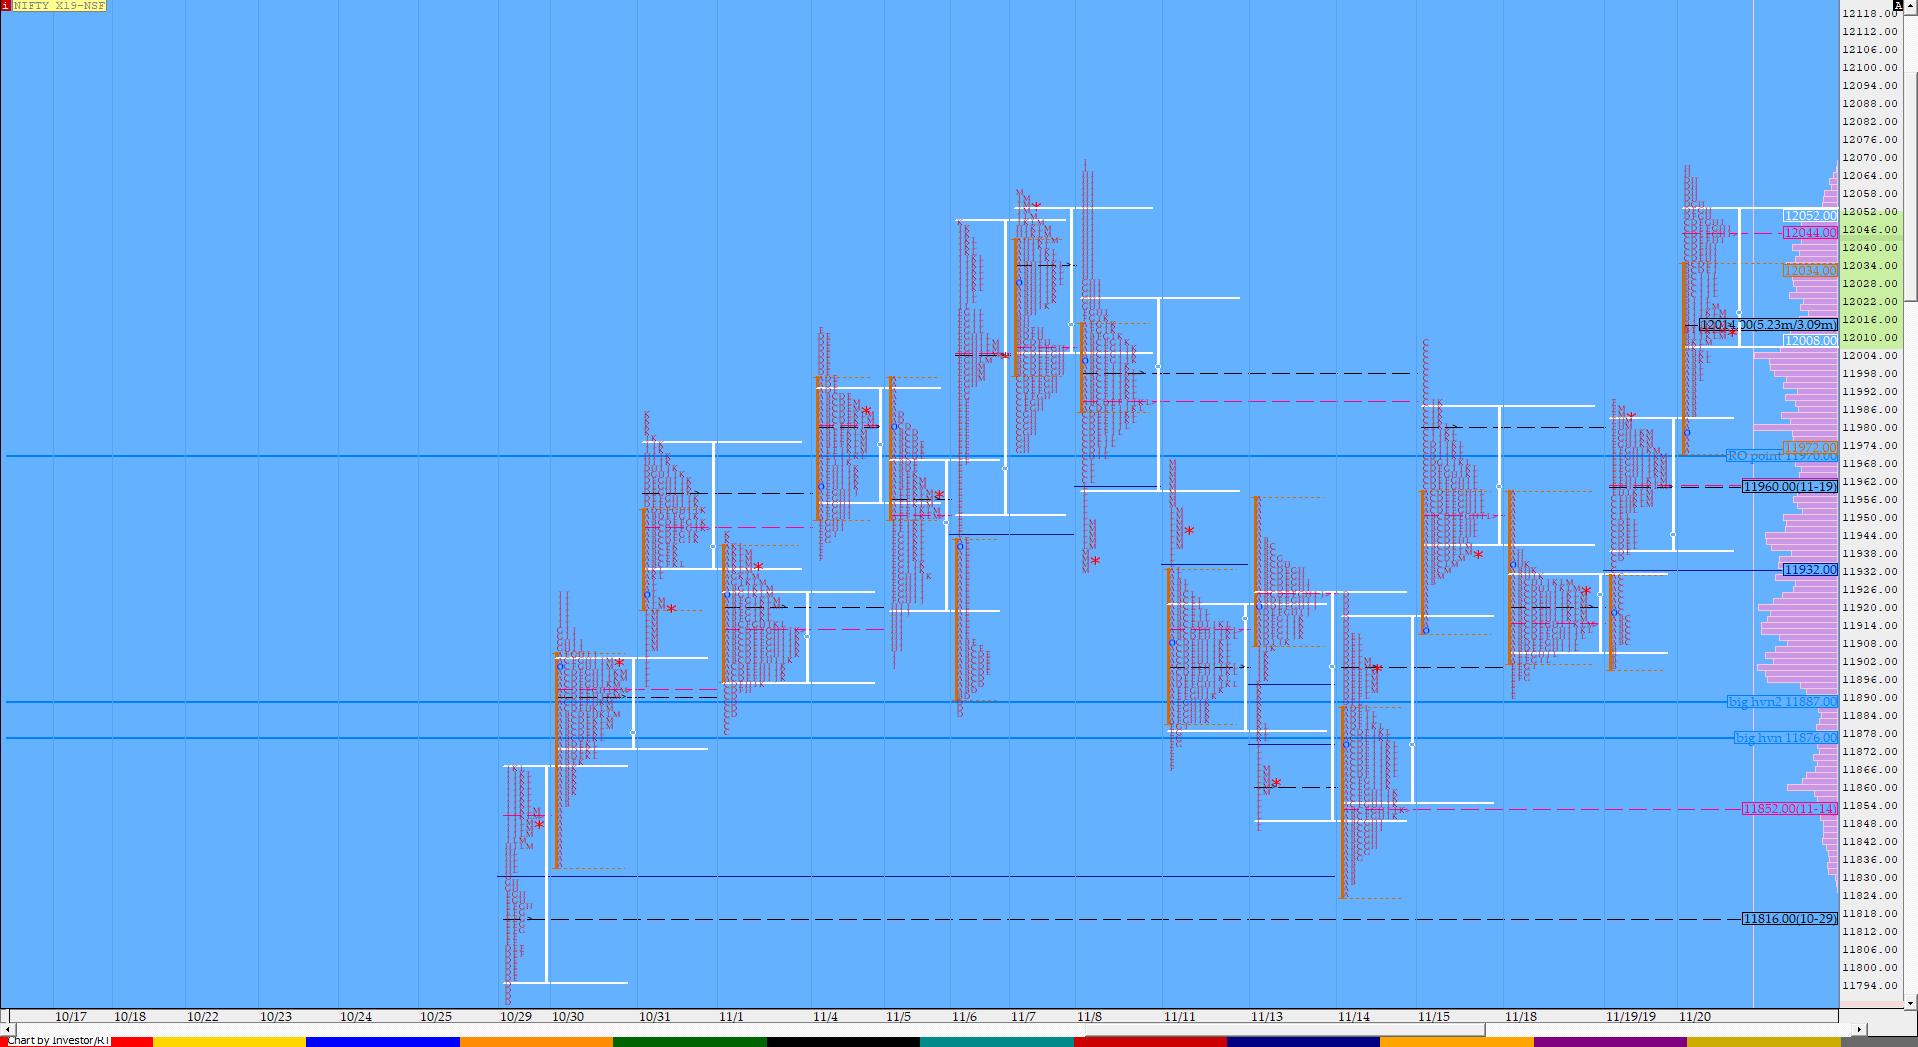 Market Profile Analysis dated 20th November 2